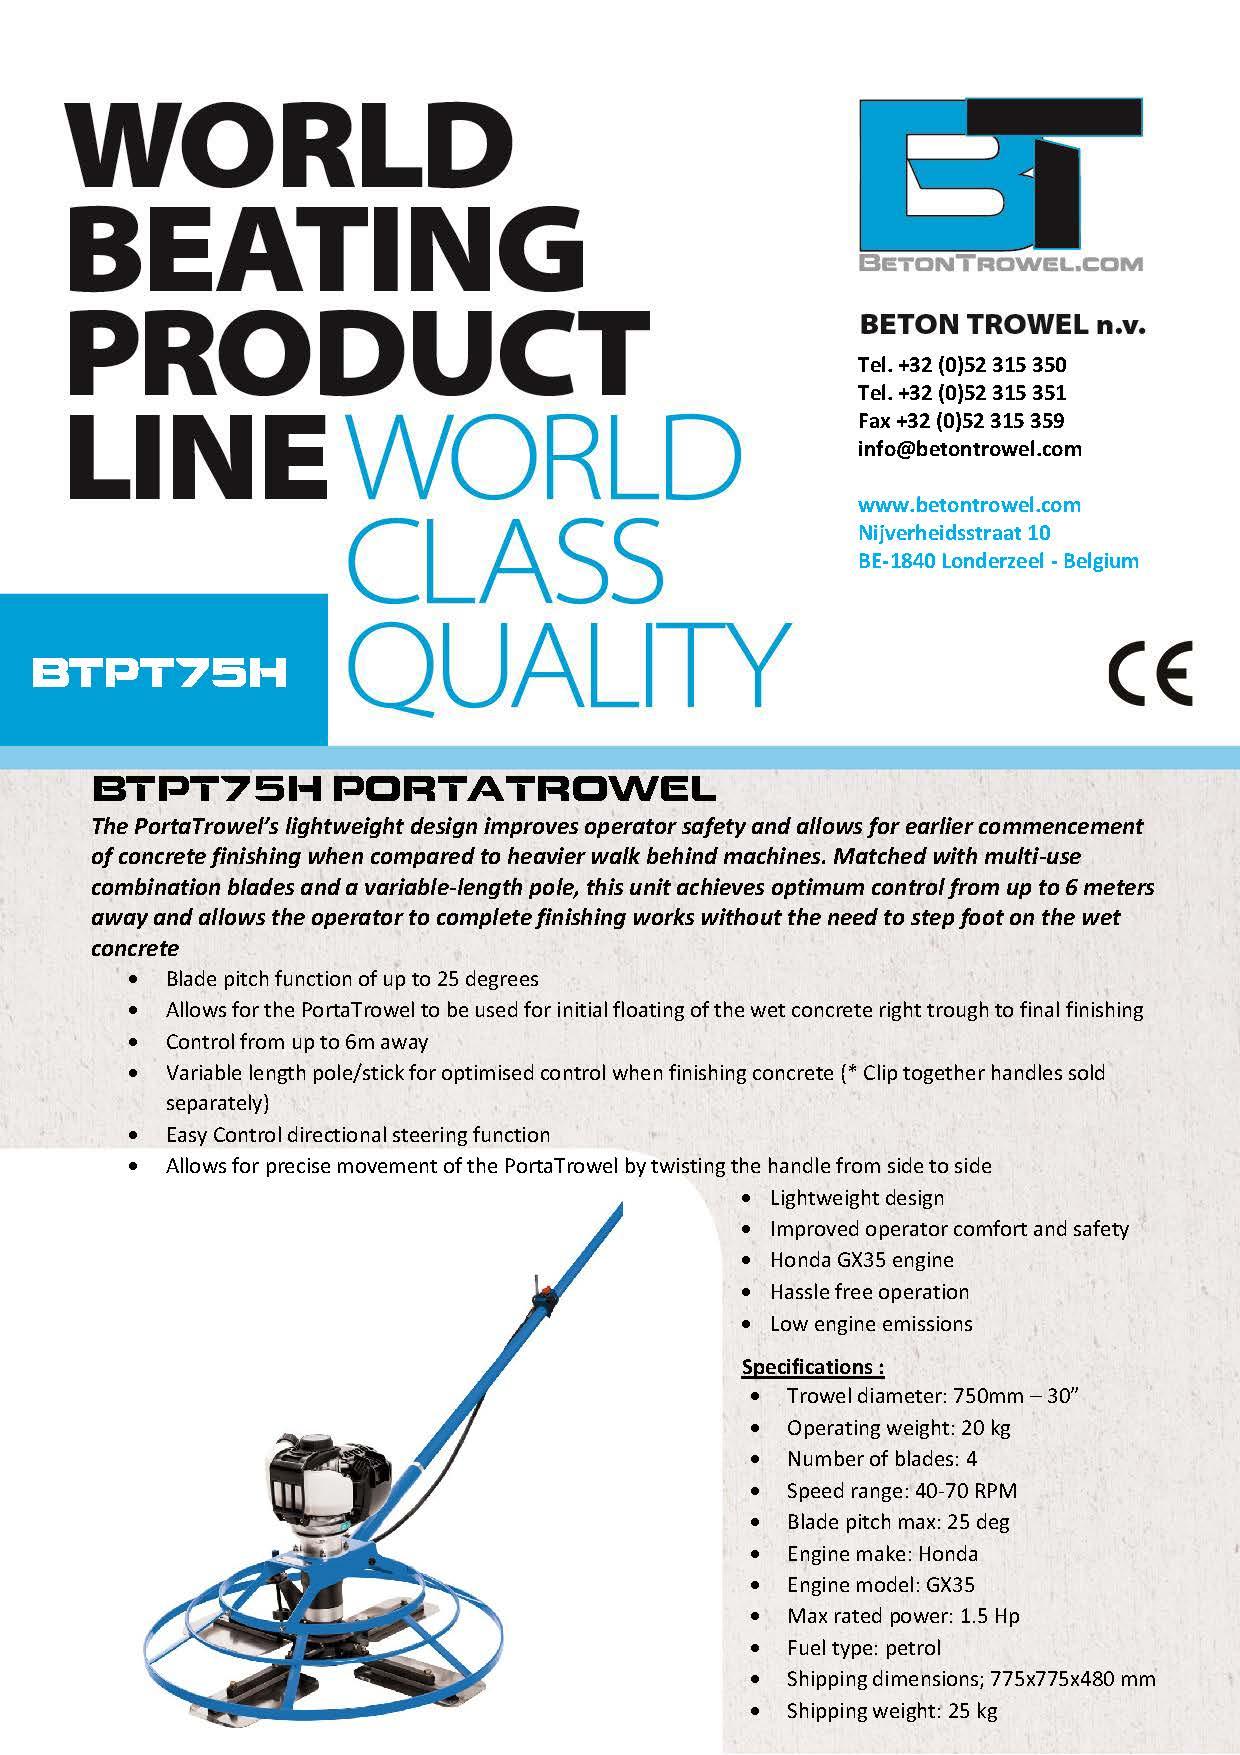 Power trowel BTPT75H